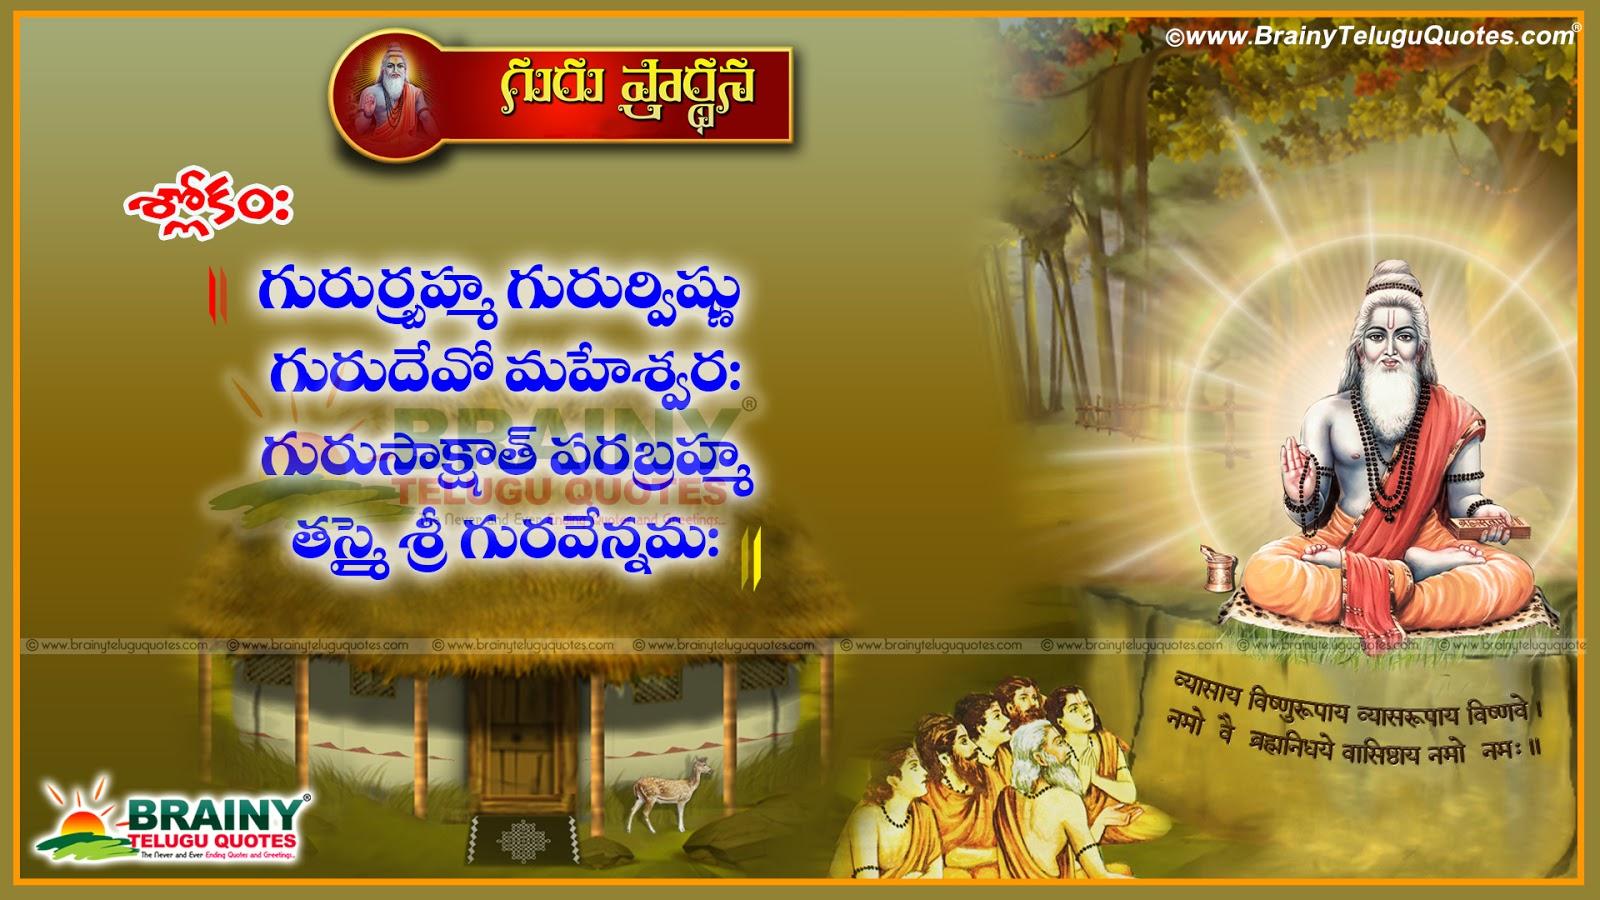 Guru brahma mp3 free download